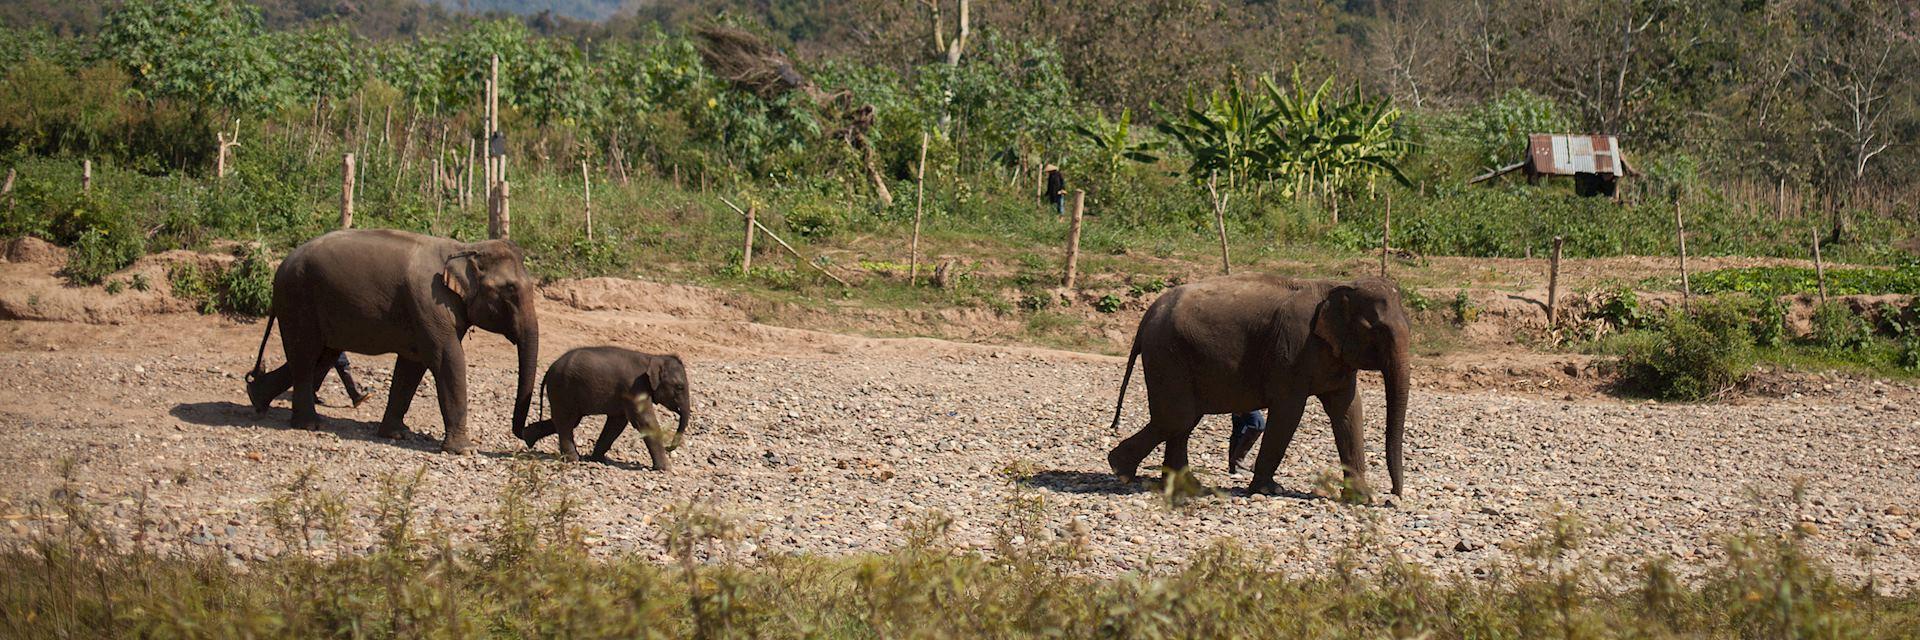 Family of elephants, Laos